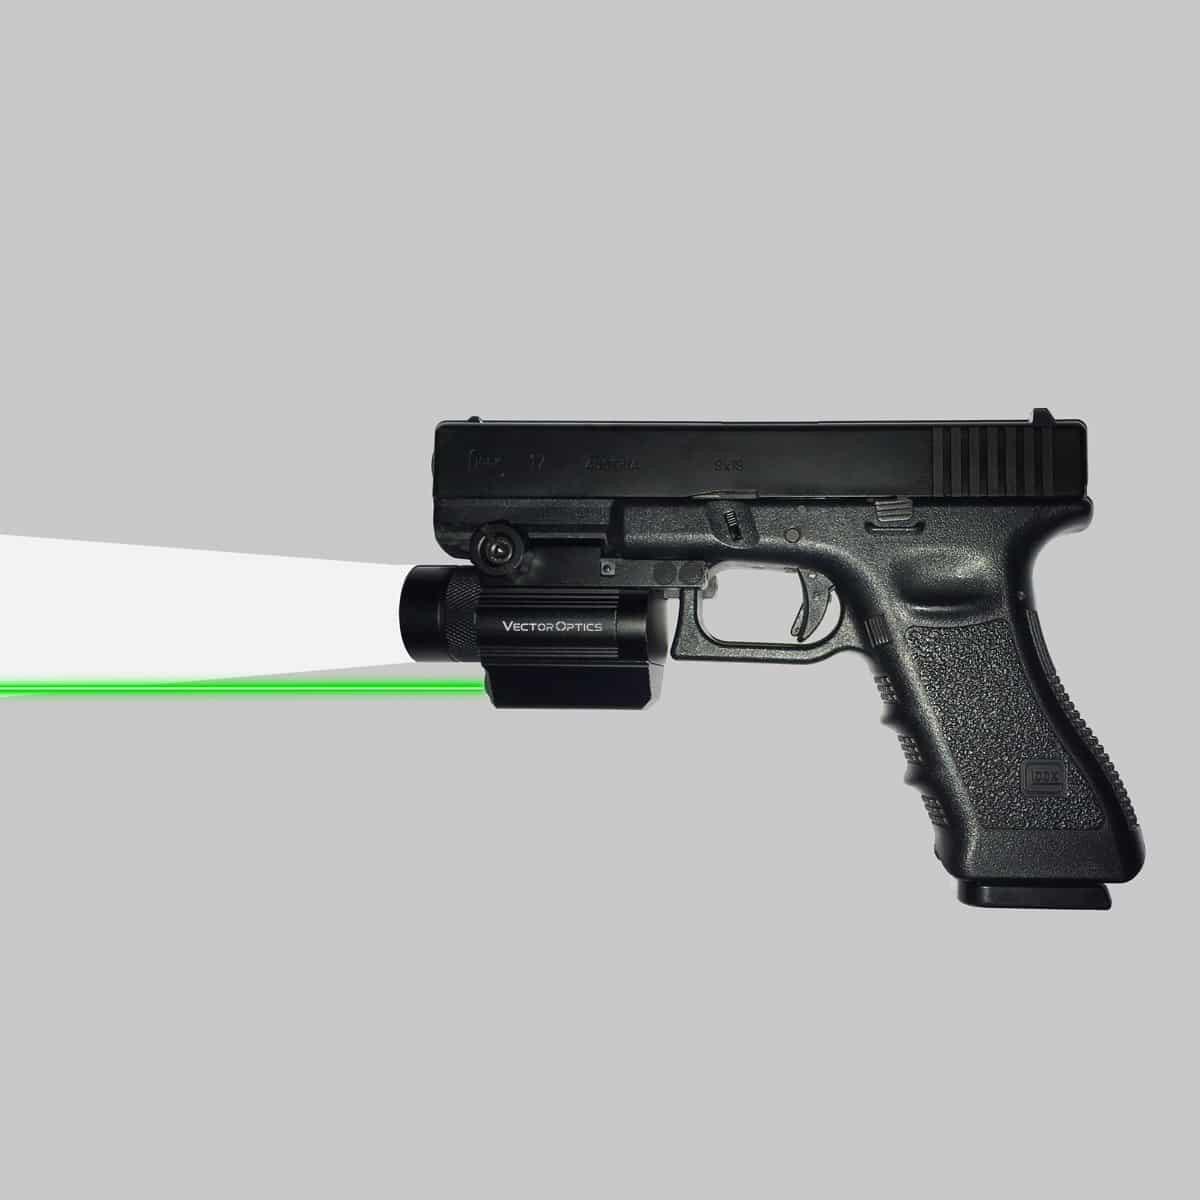 Doublecross w/ Green Laser